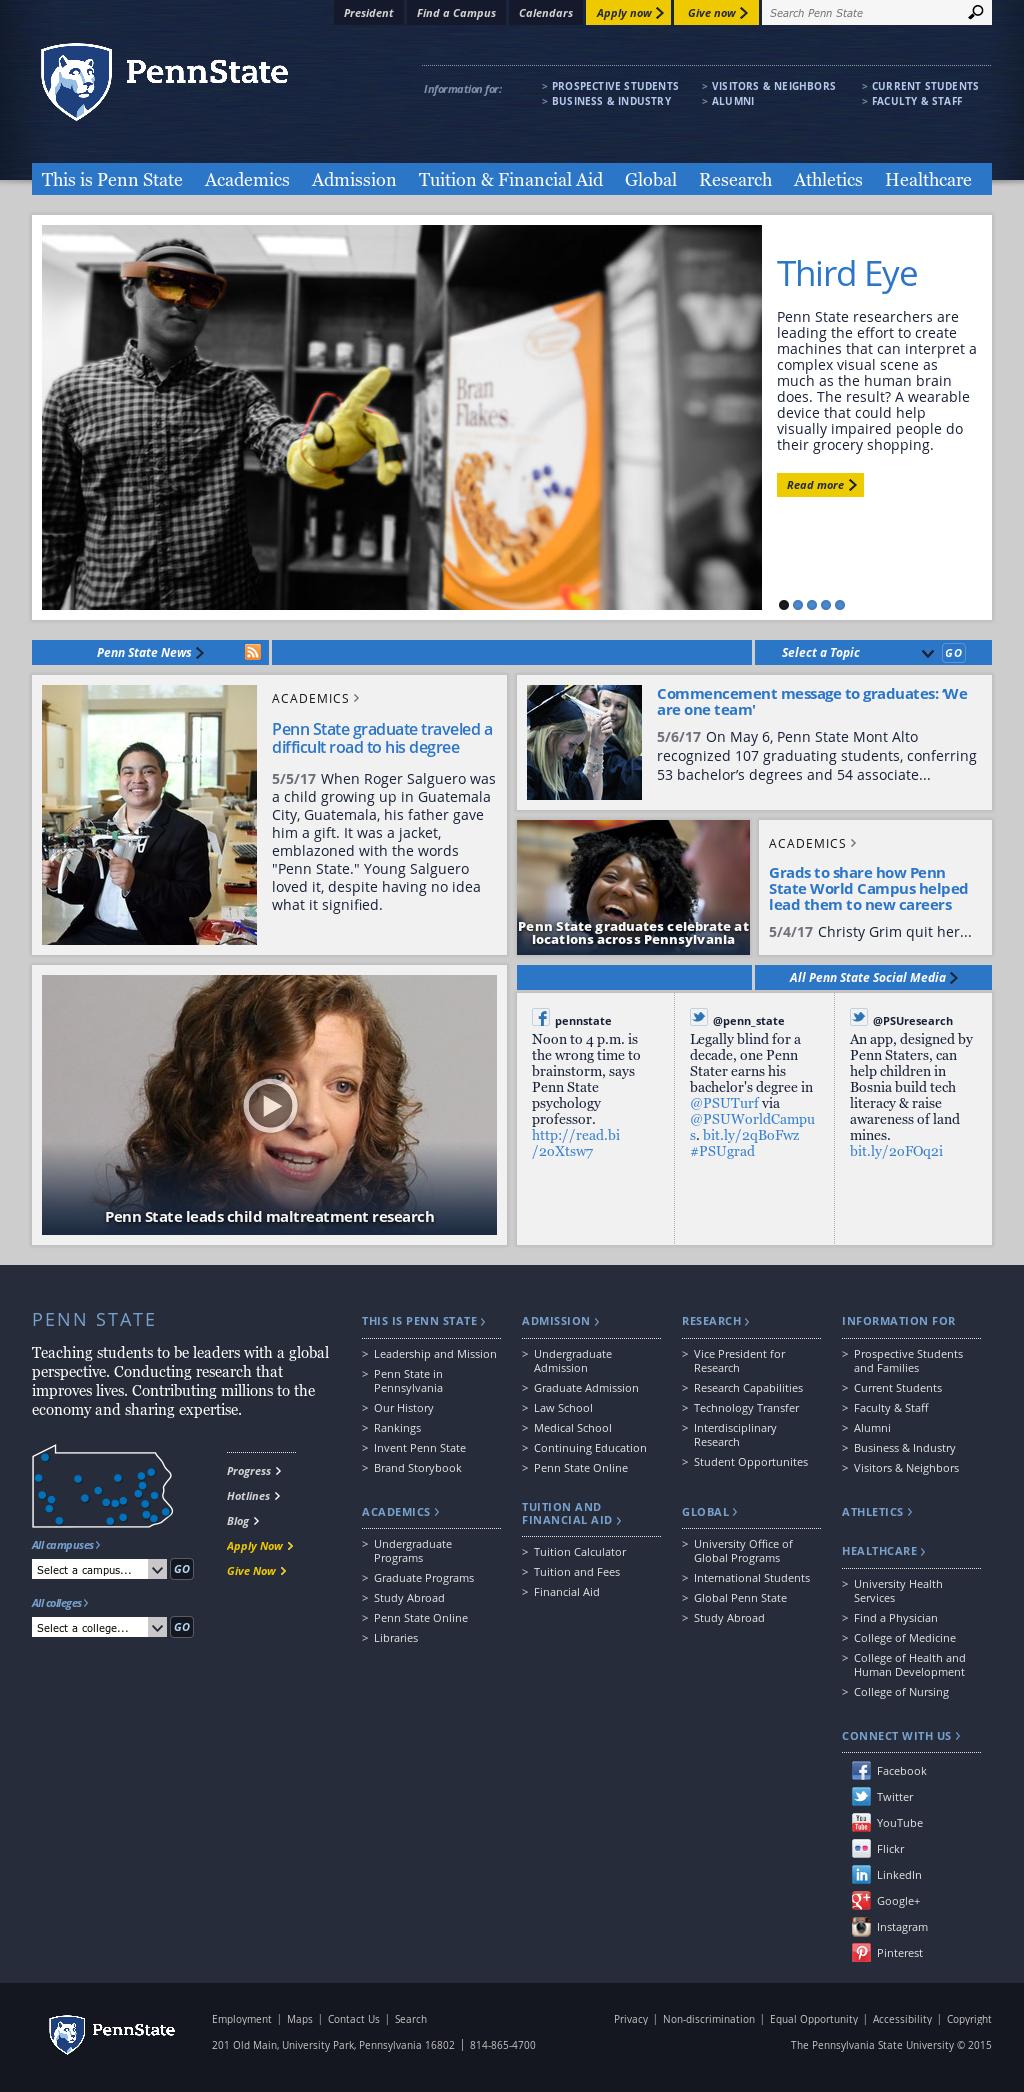 The Pennsylvania State University Competitors, Revenue and